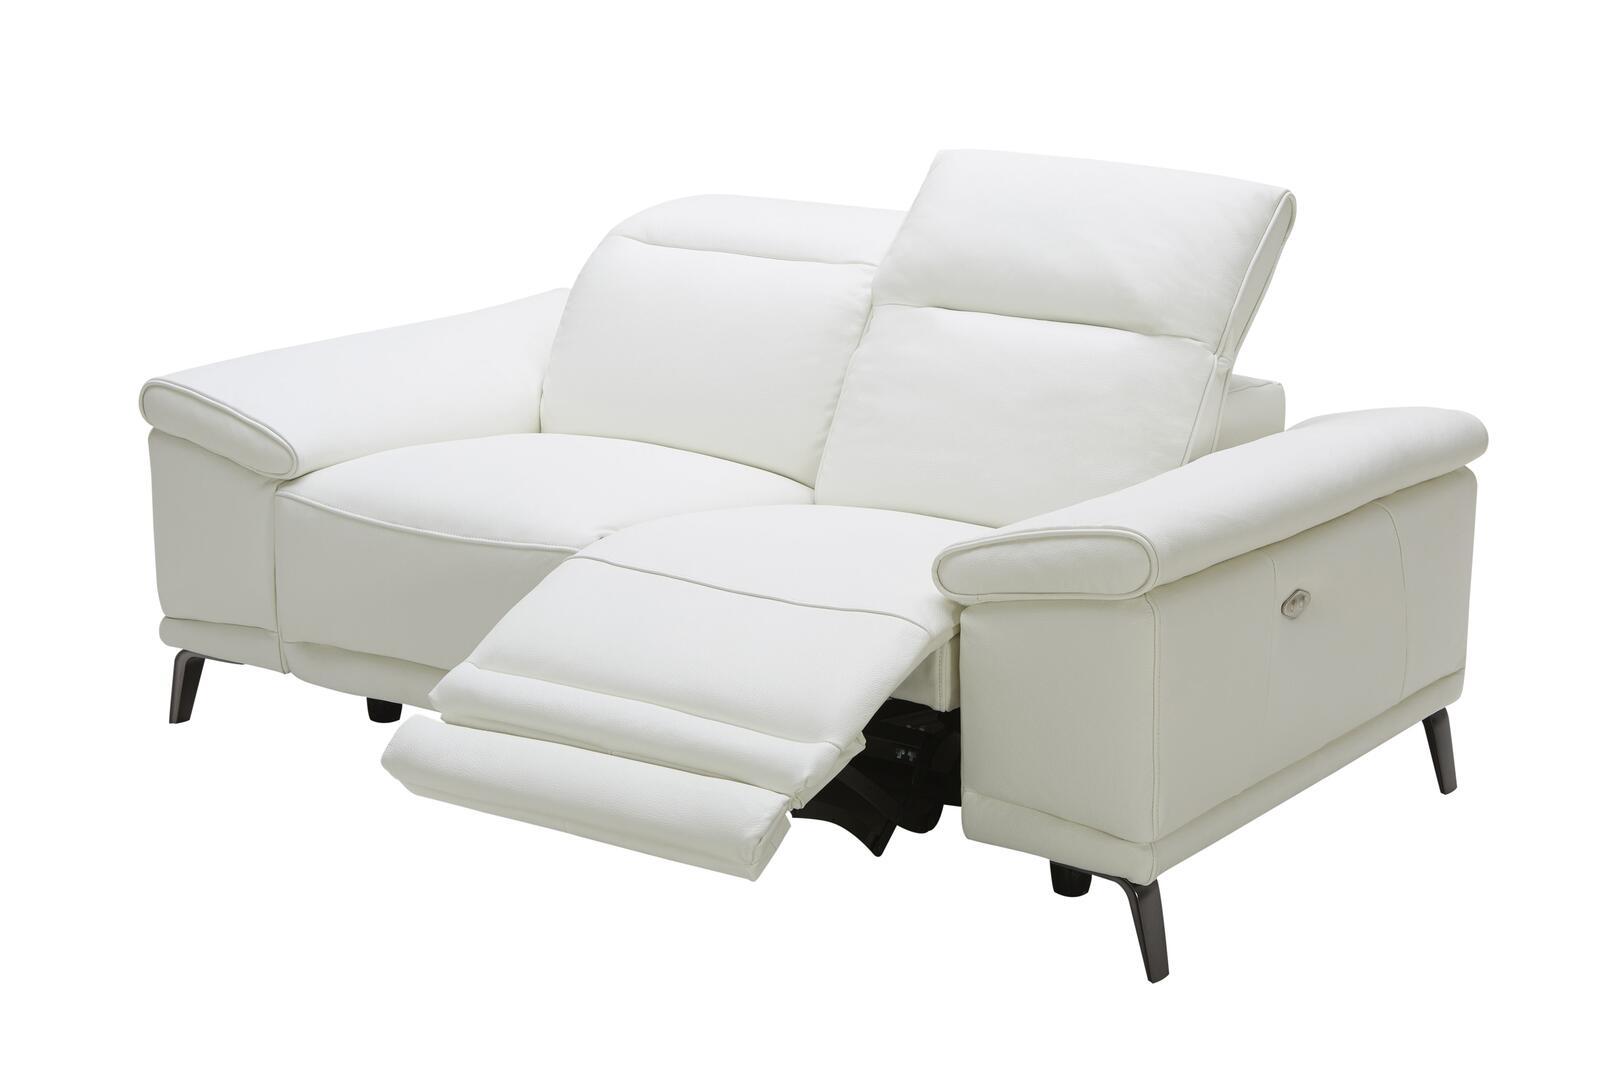 Super J And M Furniture 18253L Unemploymentrelief Wooden Chair Designs For Living Room Unemploymentrelieforg